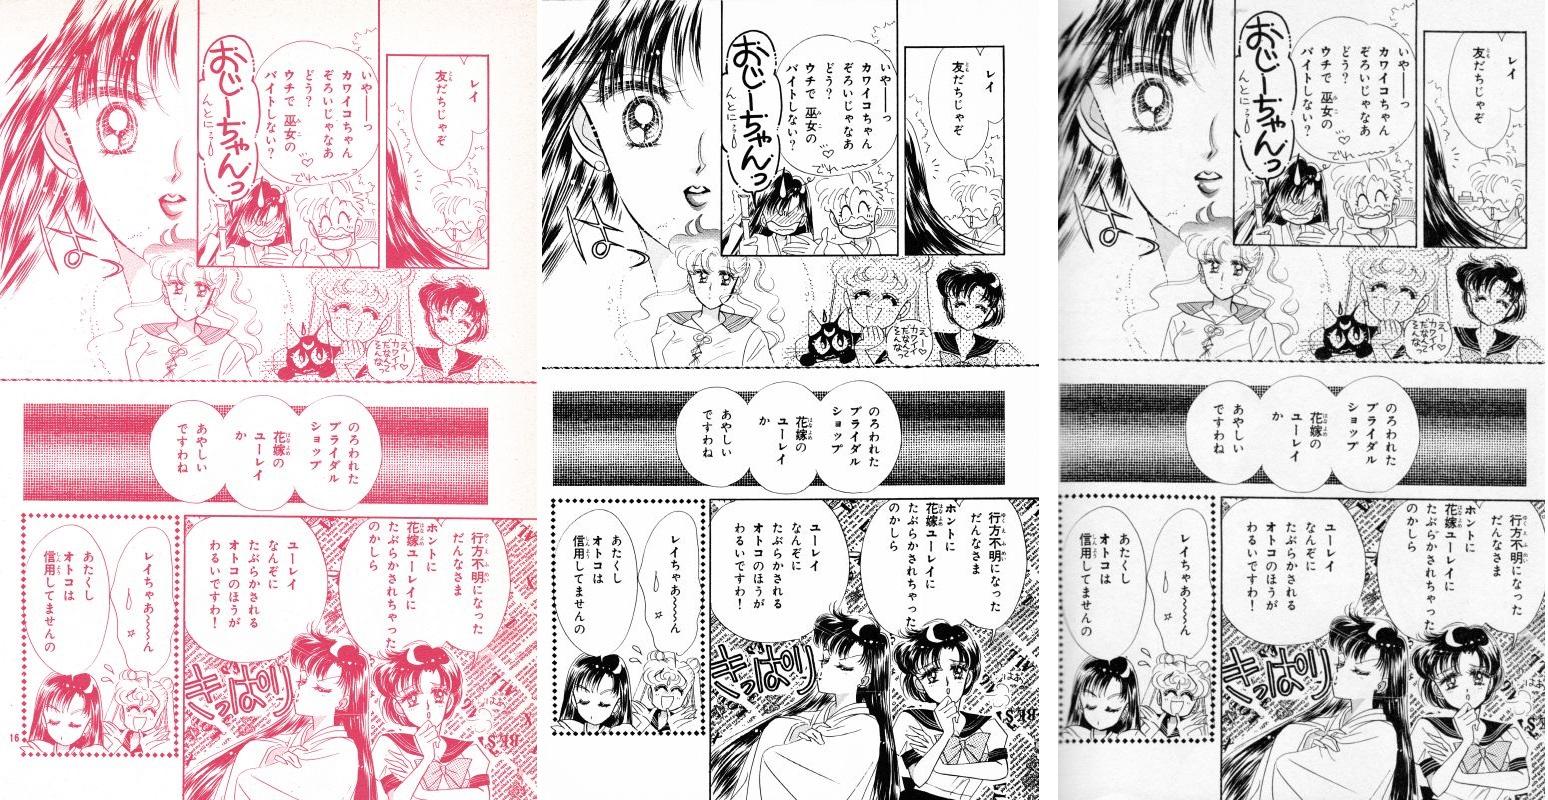 Act 5, Page 14 – Nakayoshi, Original, Remaster